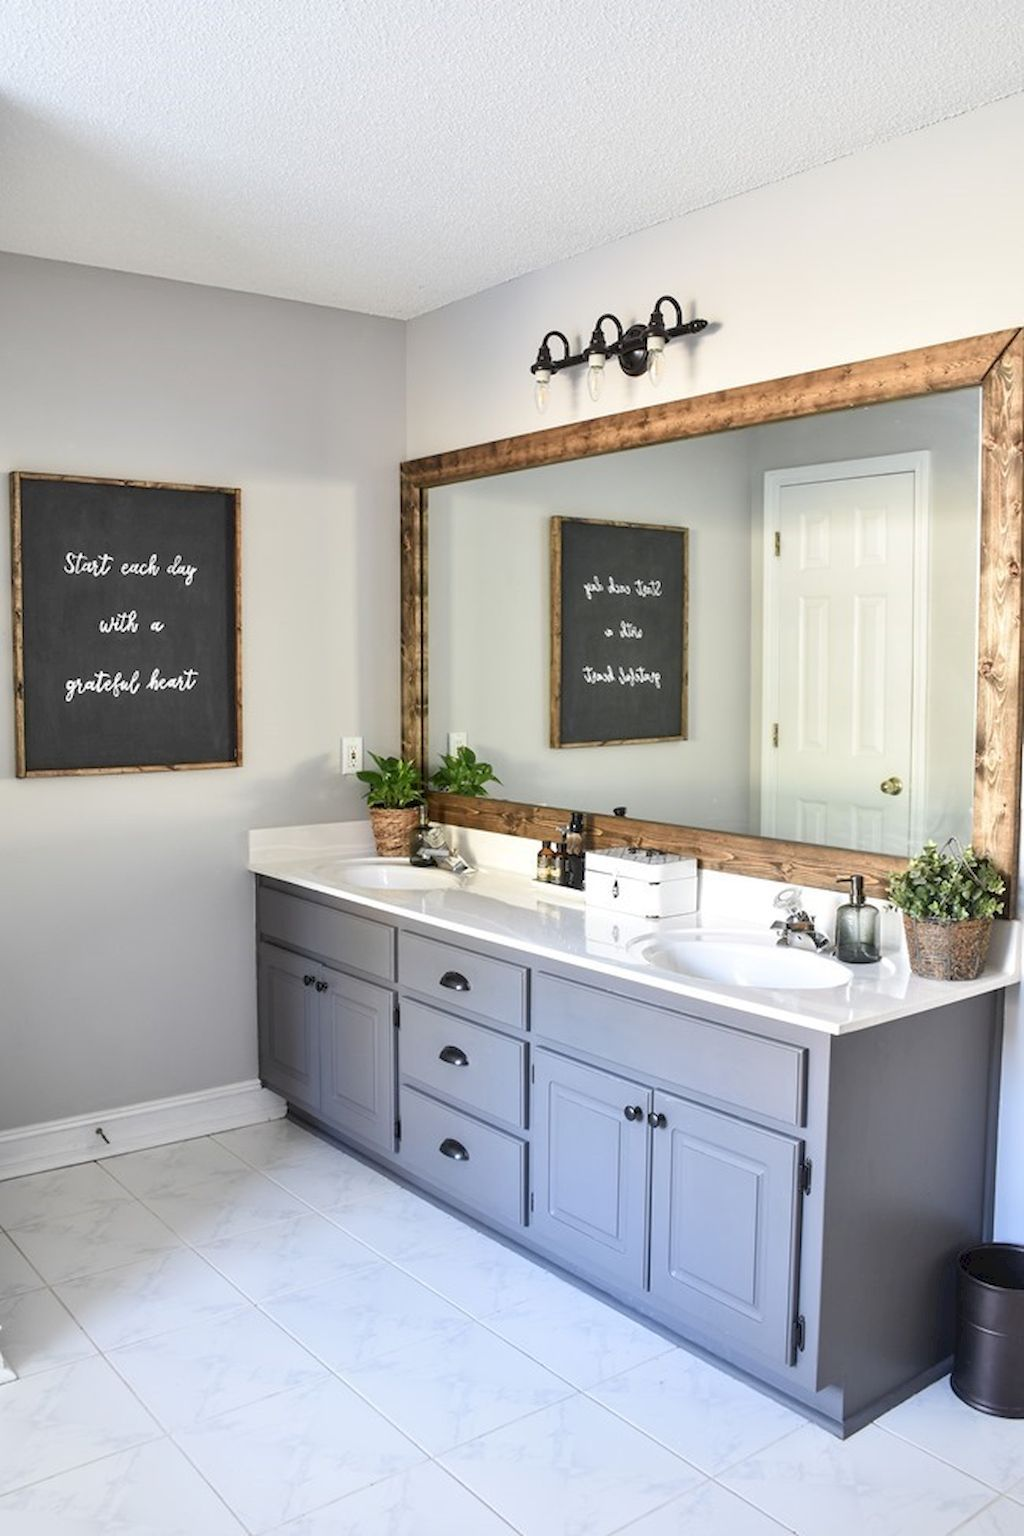 60 Beautiful Master Bathroom Ideas In 2020 Master Bathroom Makeover Master Bathroom Decor Bathroom Remodel Master